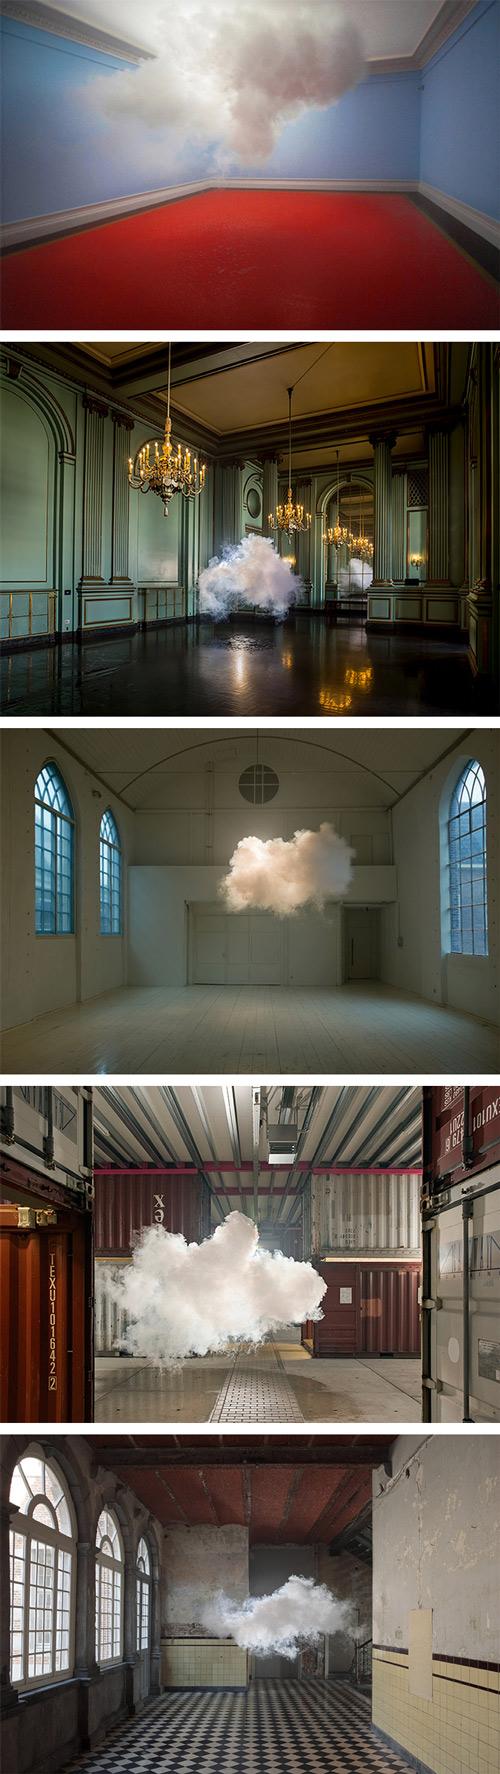 Nimbus Series, 2012-2013, by Berndnaut Smilde  Digital C-type Prints Photos: various